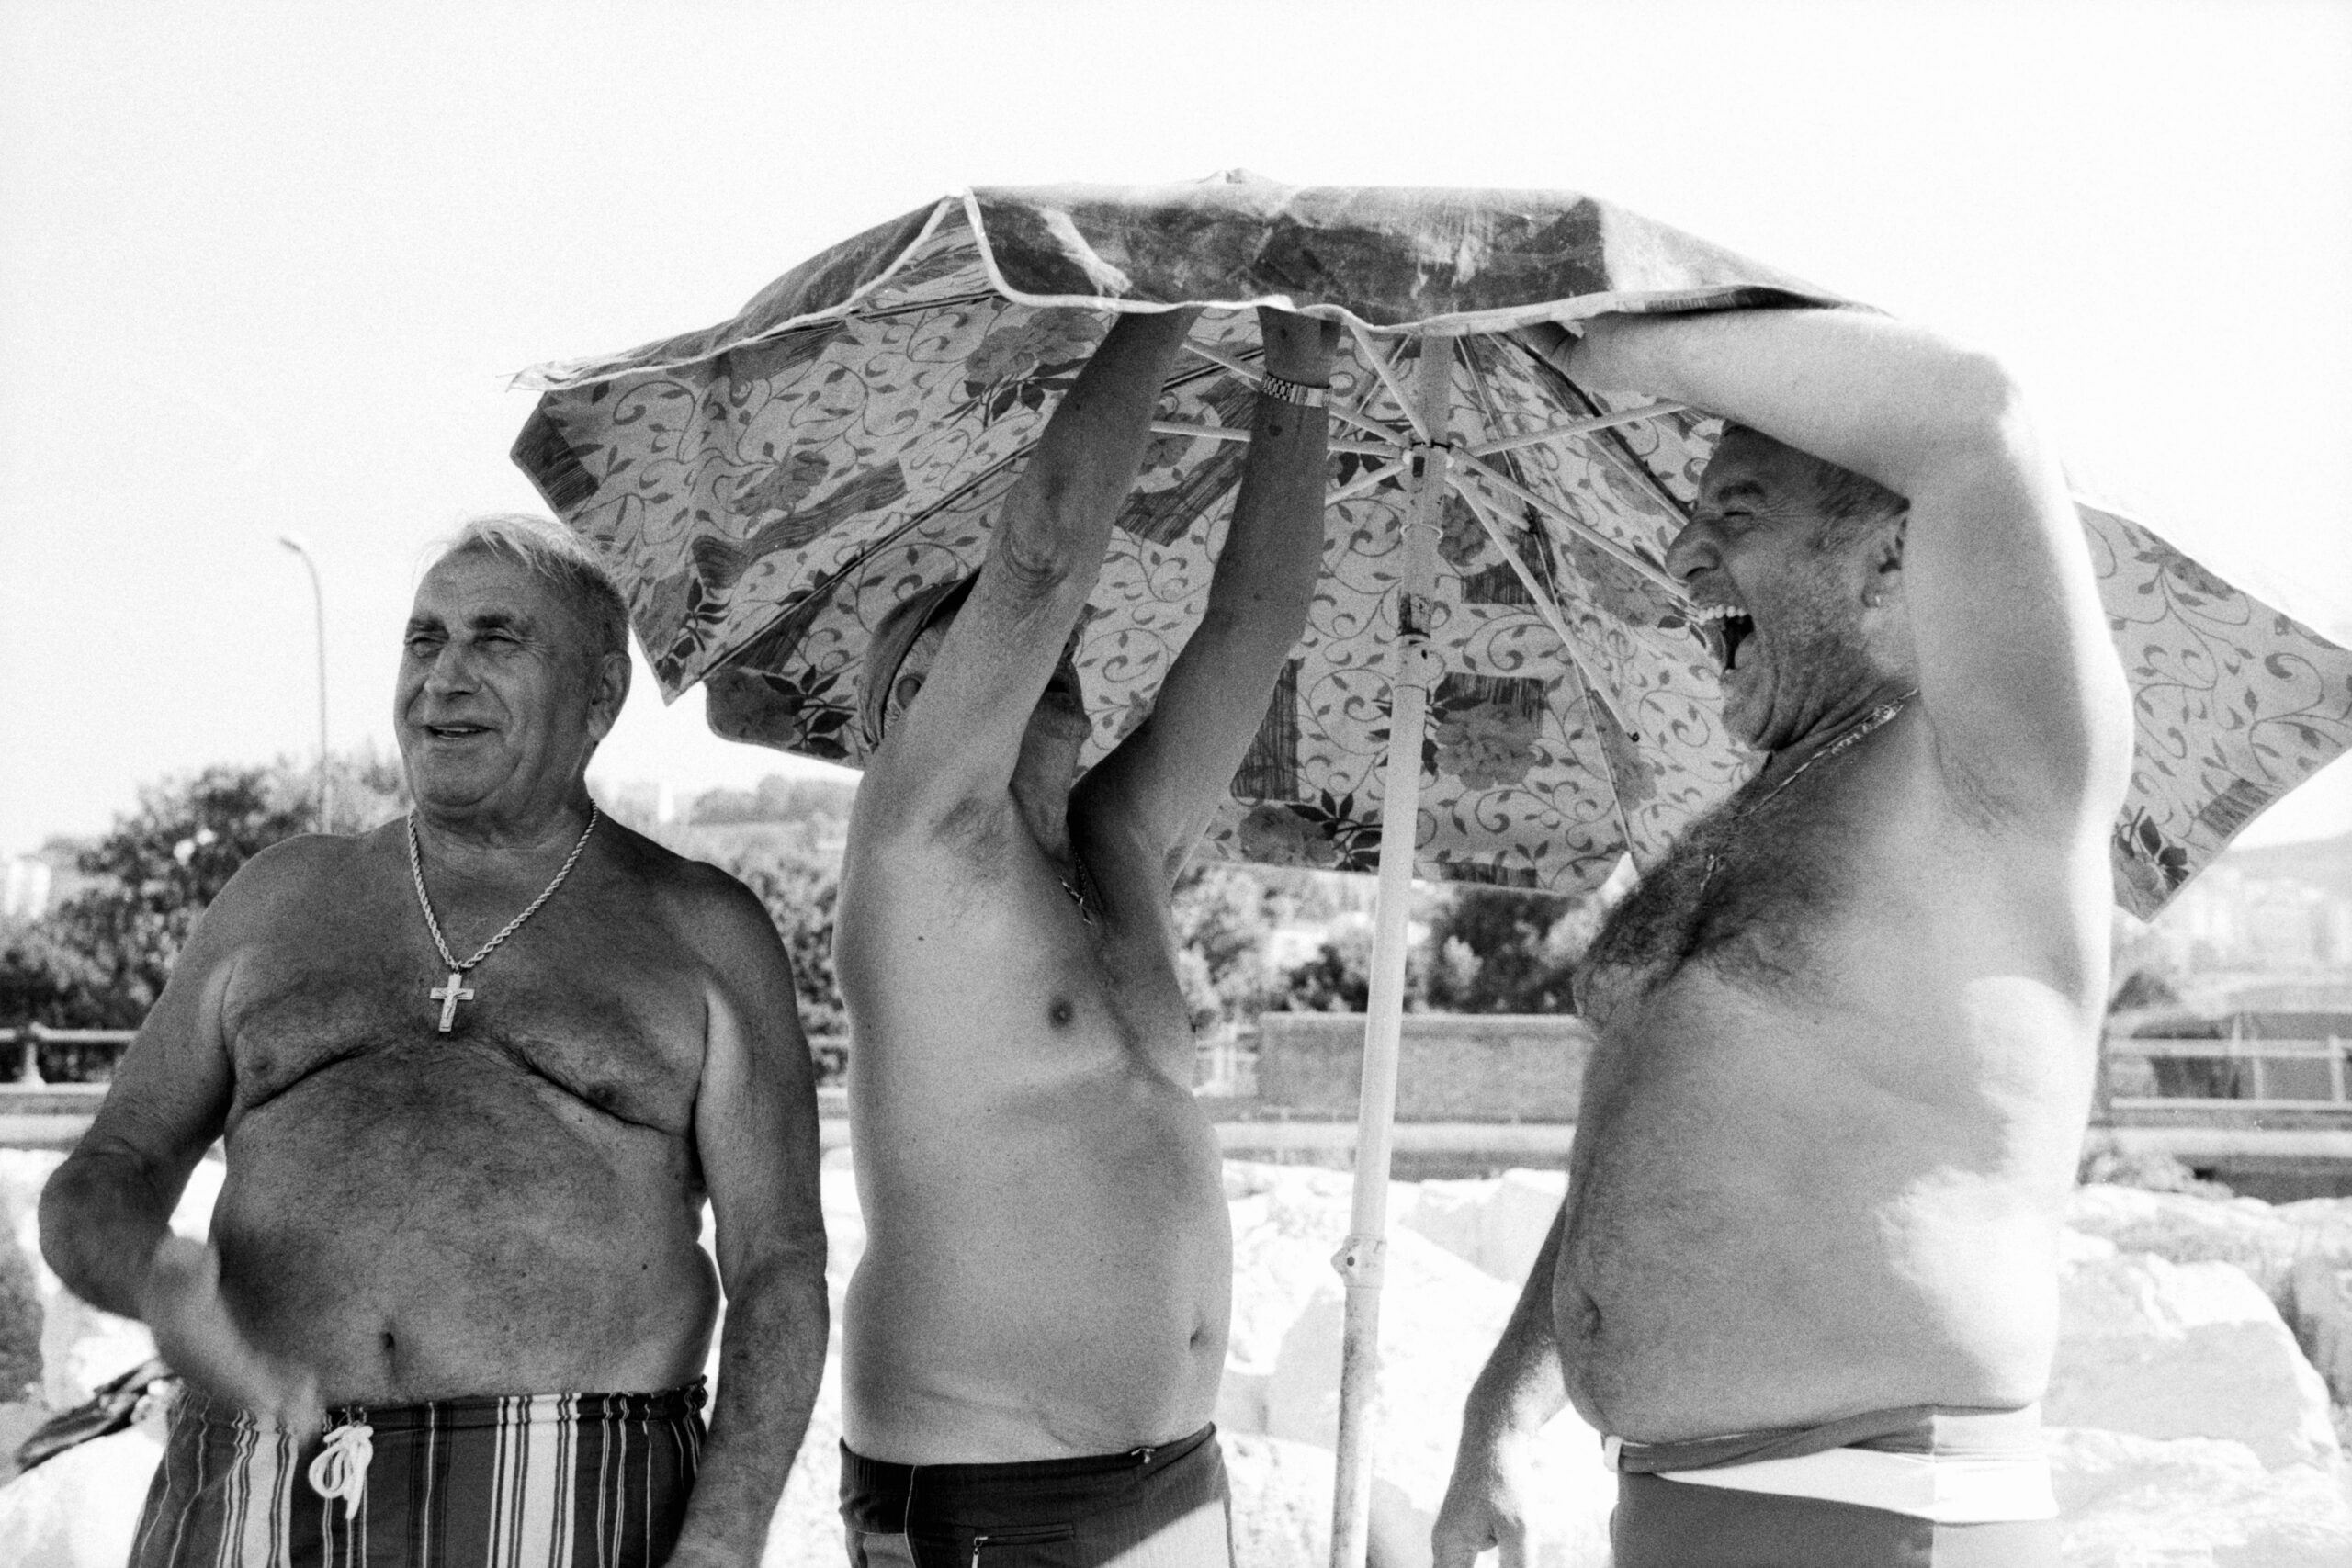 @iamtheregulator Napoli - M6, Summicron 35 asph, FP4 #ilfordphoto #fridayfavourites #35mmfp4